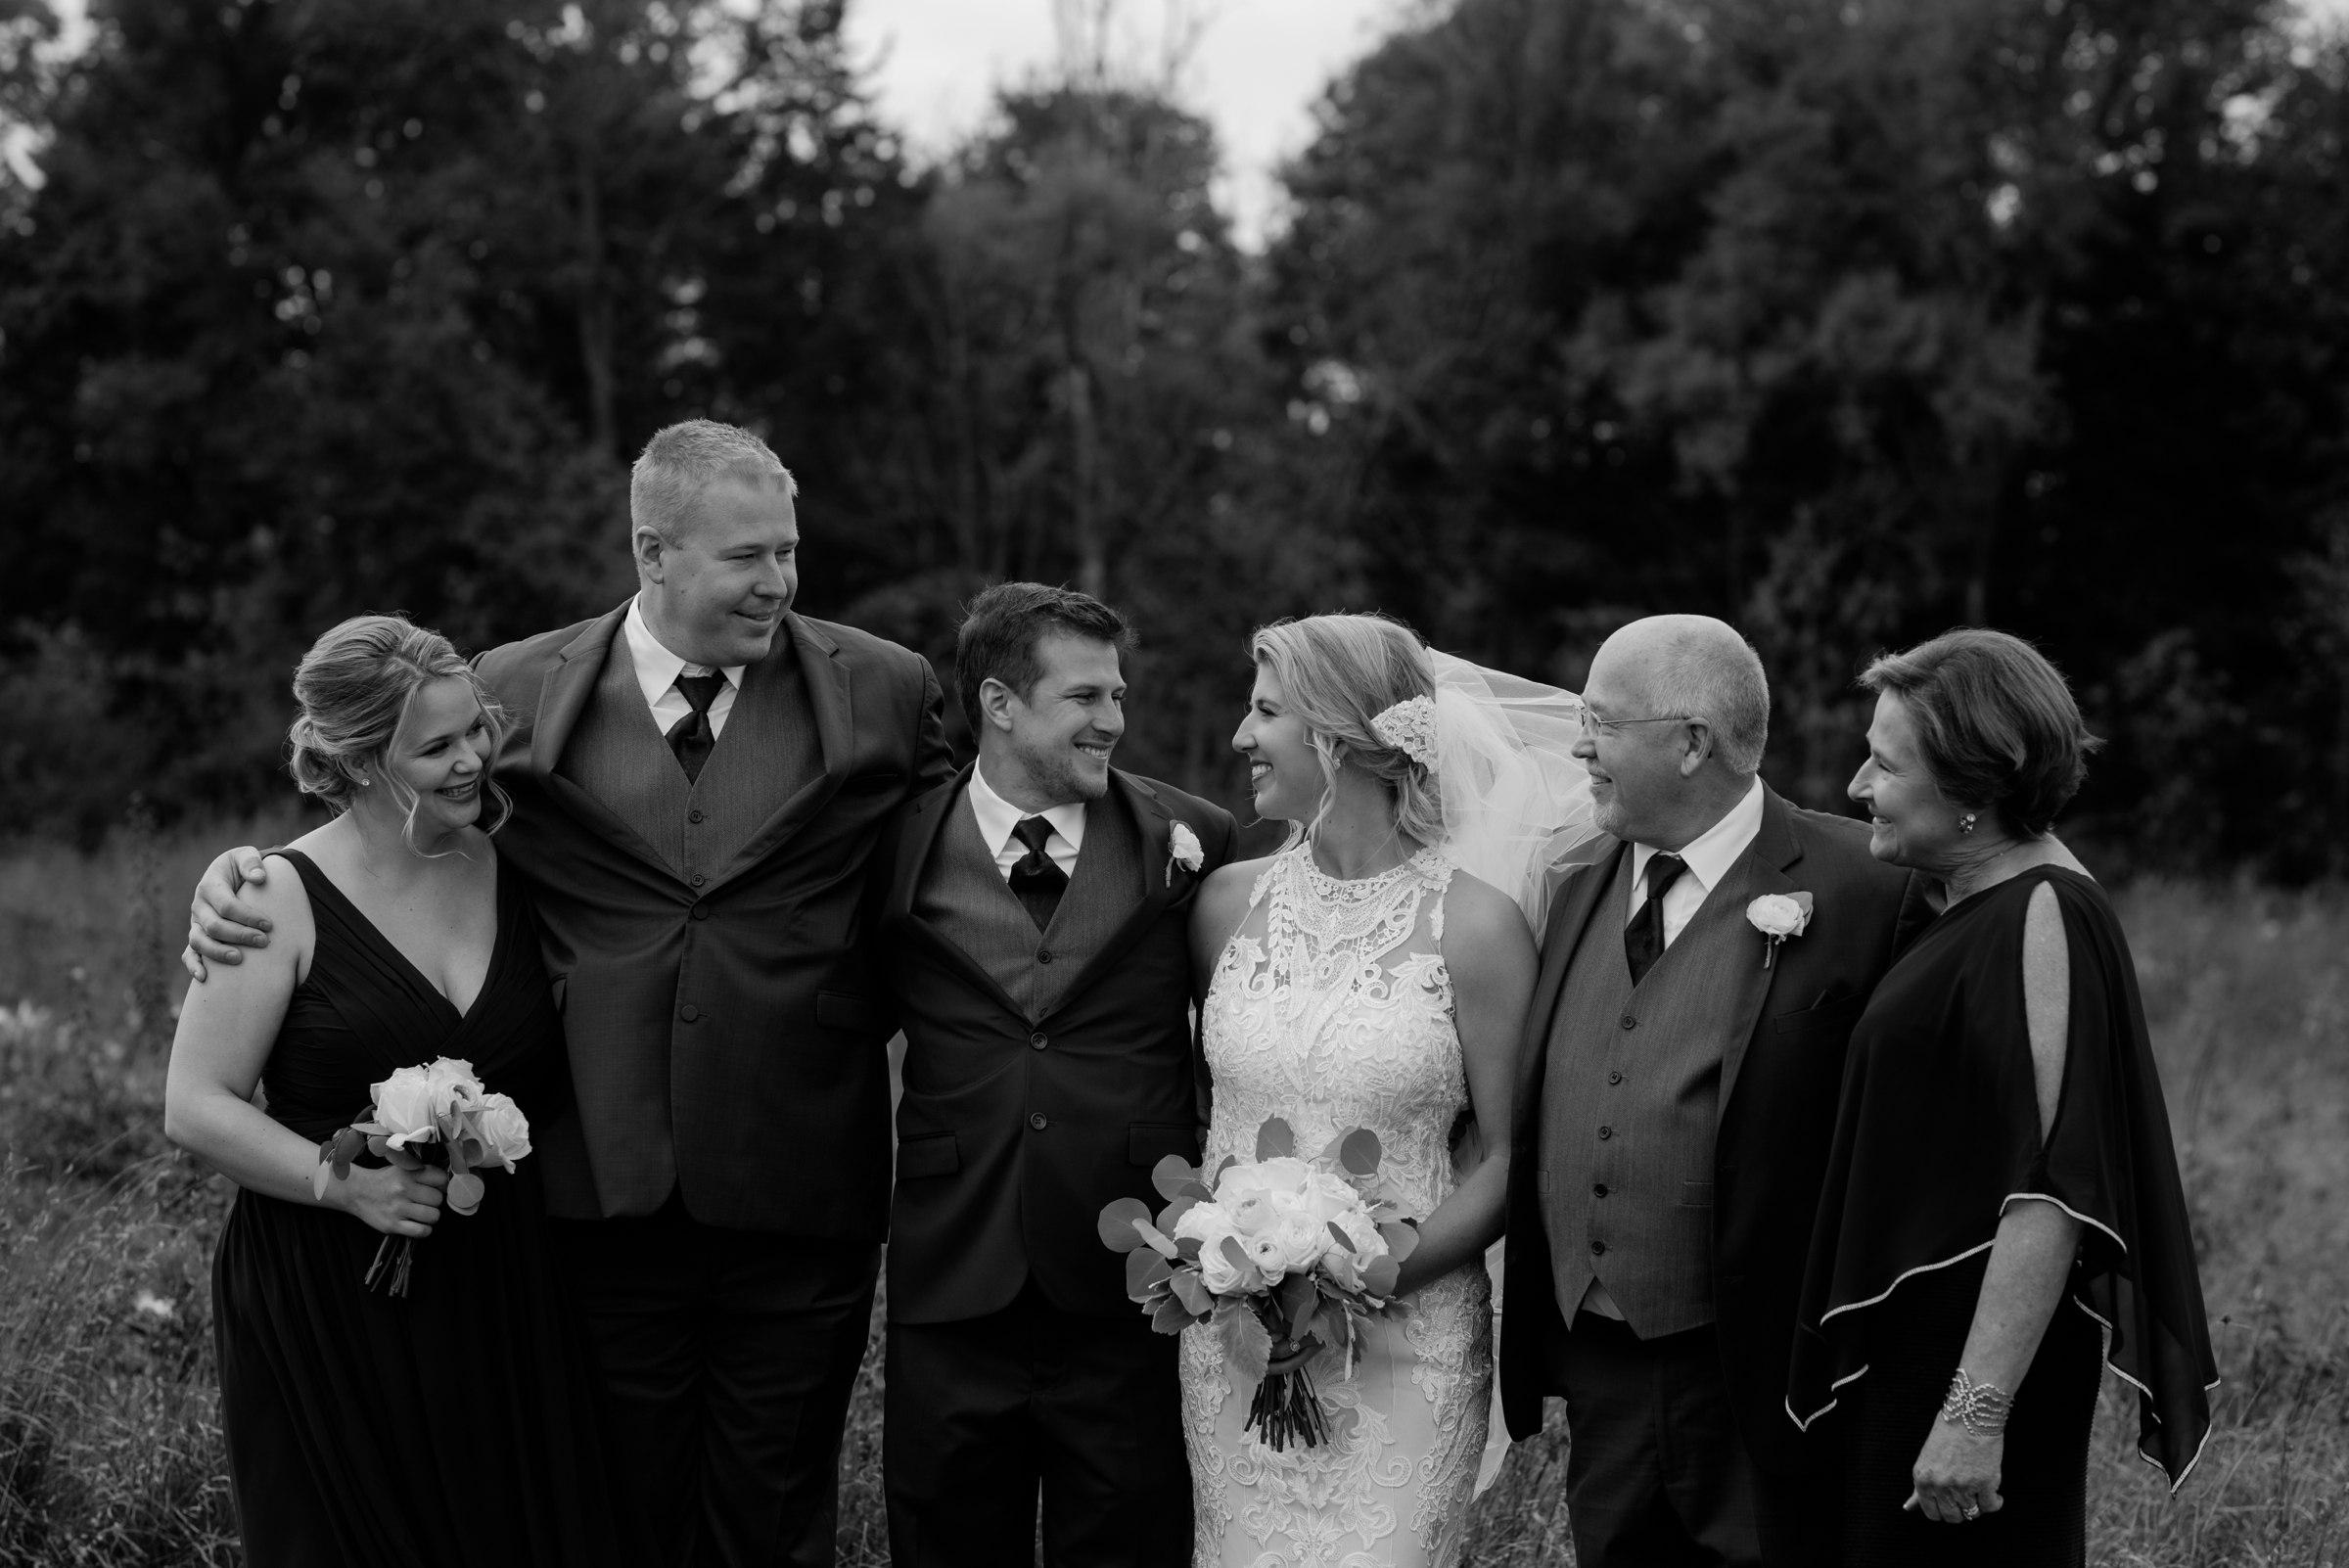 elopement-photographer-austin-best-wedding-minneapolis-adventurous-wedding-modern-morocco-new york-new orleans-mexica-costa rica-italy-affordable-best_0052.jpg